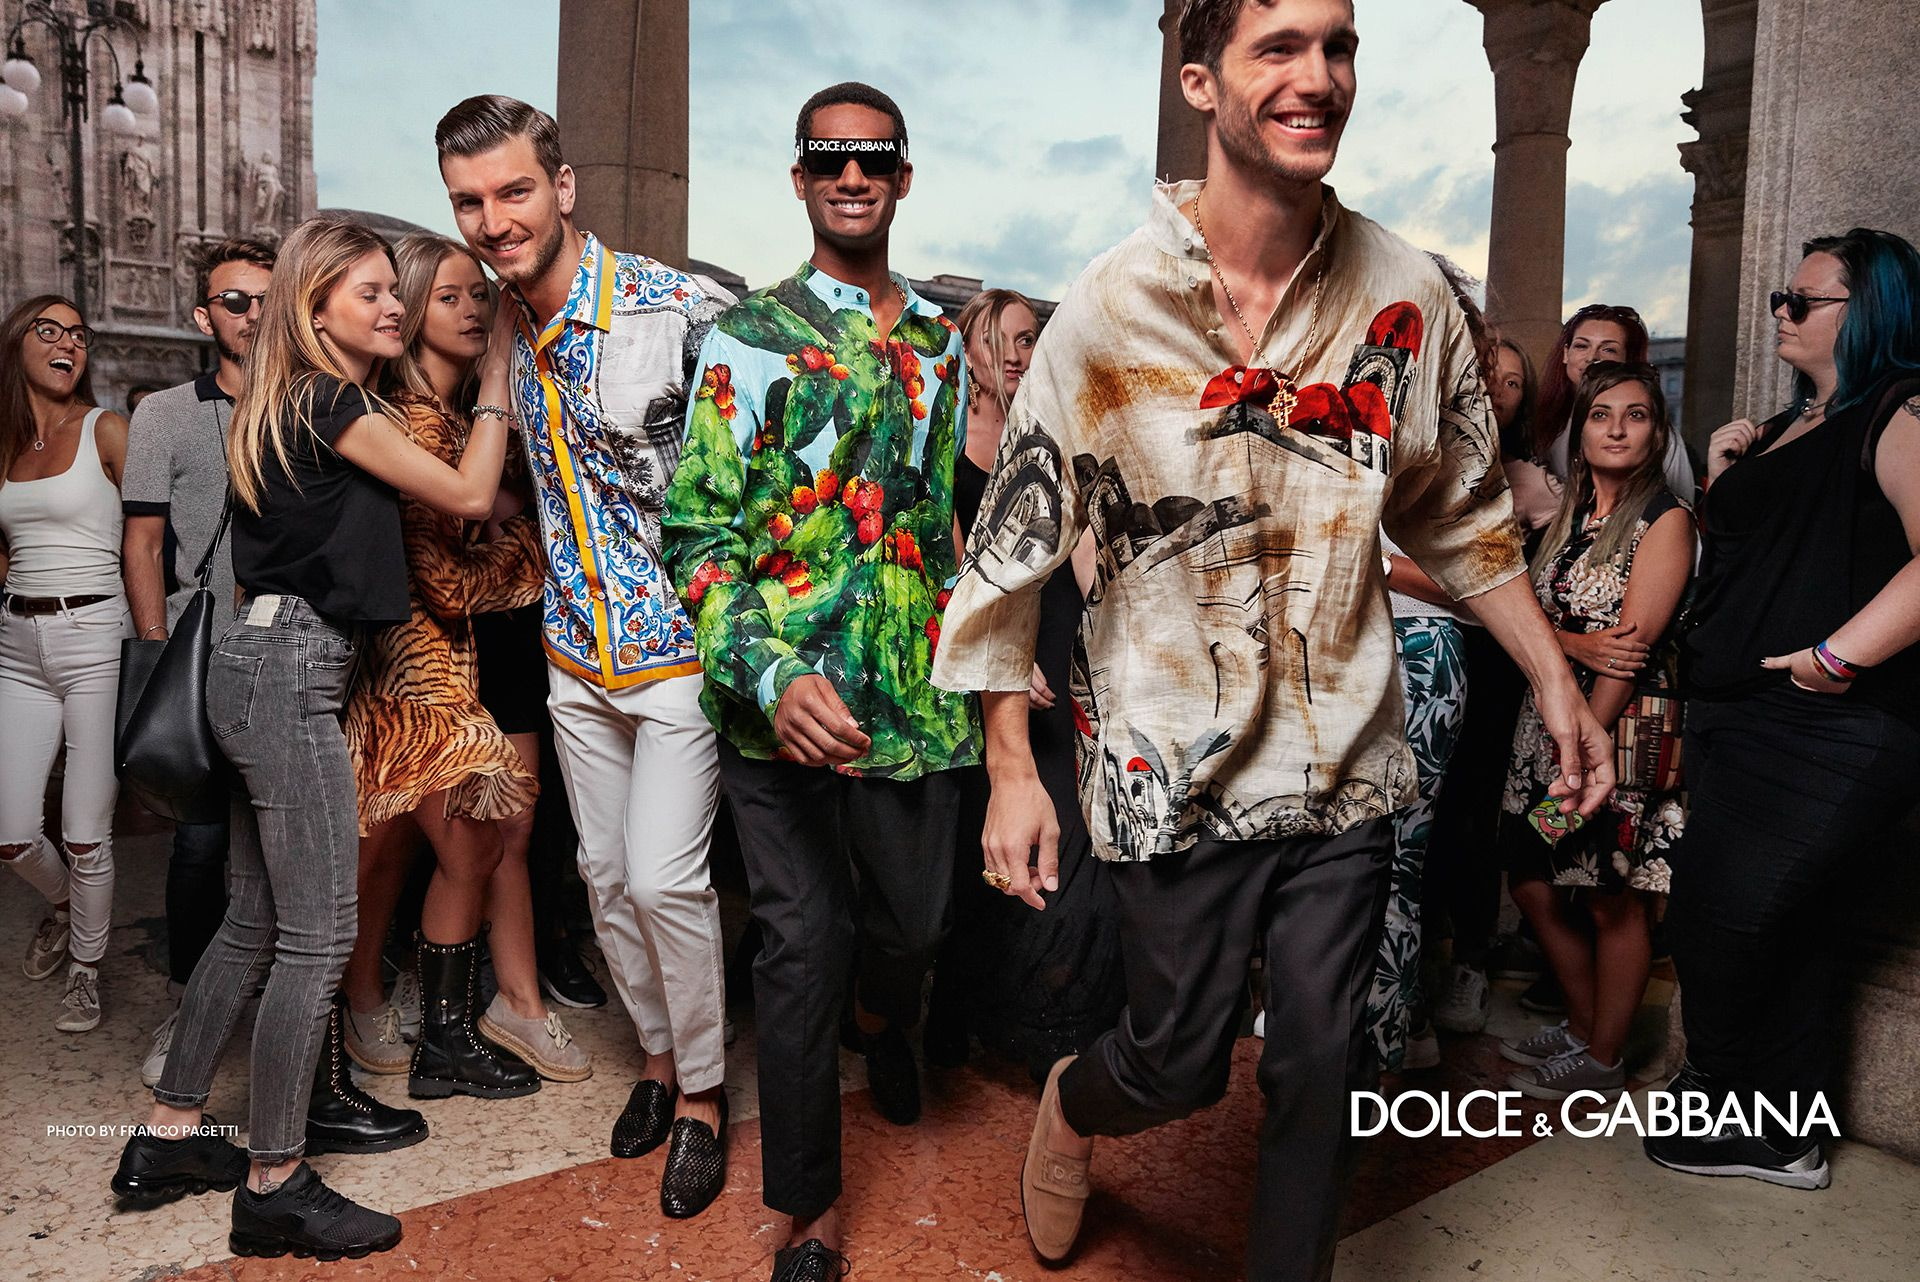 1e86810d9f63 Dolce Gabbana Men s Spring Summer 2019 by Franco Pagetti - L Homme Dolce  Gabbana Descend